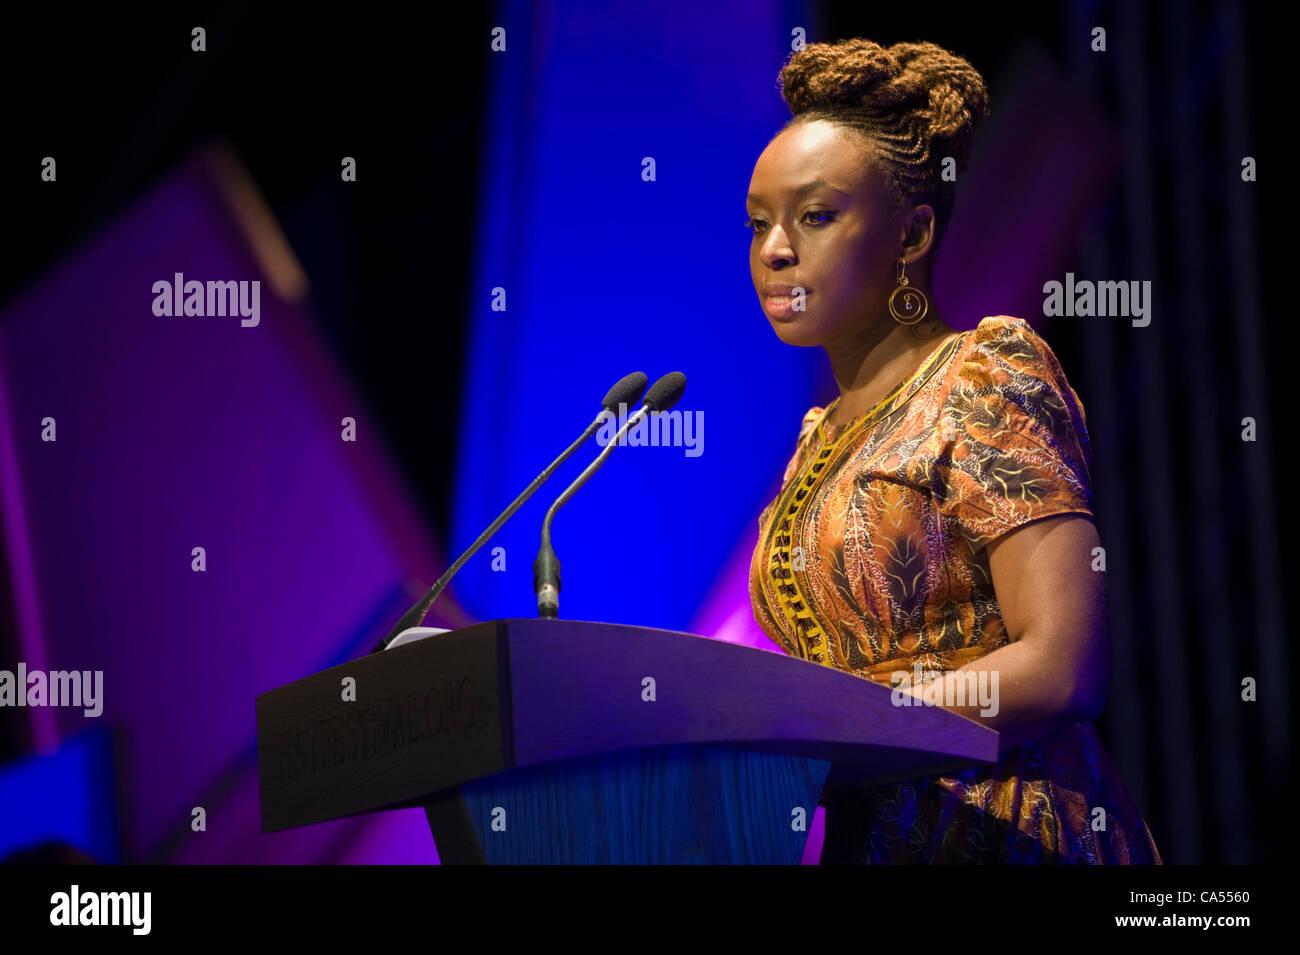 chimamanda-ngozi-adichie-nigerian-author-giving-the-commonwealth-lecture-CA5560.jpg